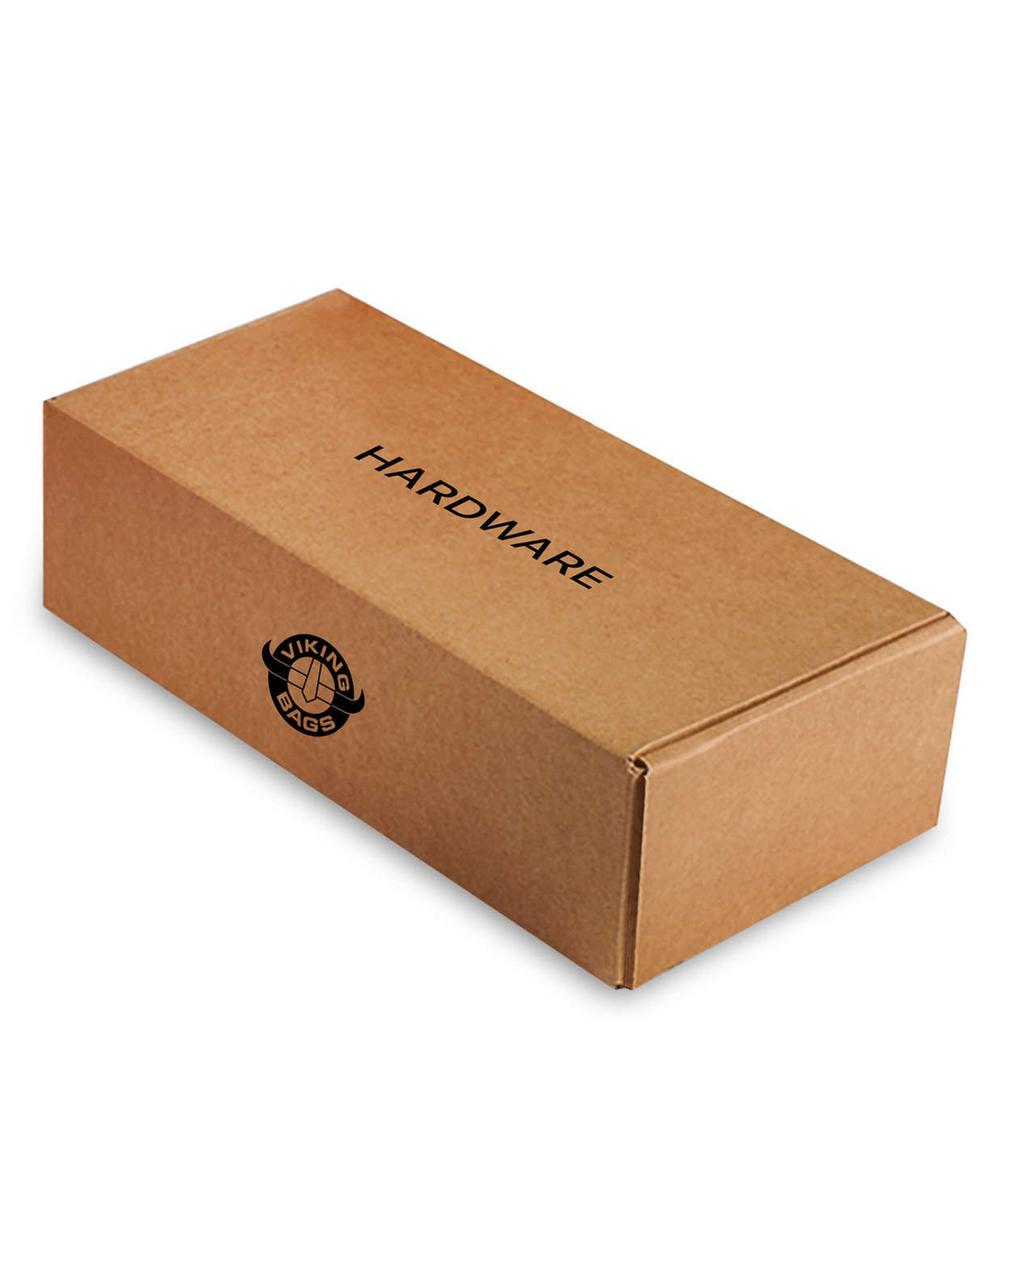 Honda CMX 250C Rebel 250 Warrior Medium Motorcycle Saddlebags Hardware Box